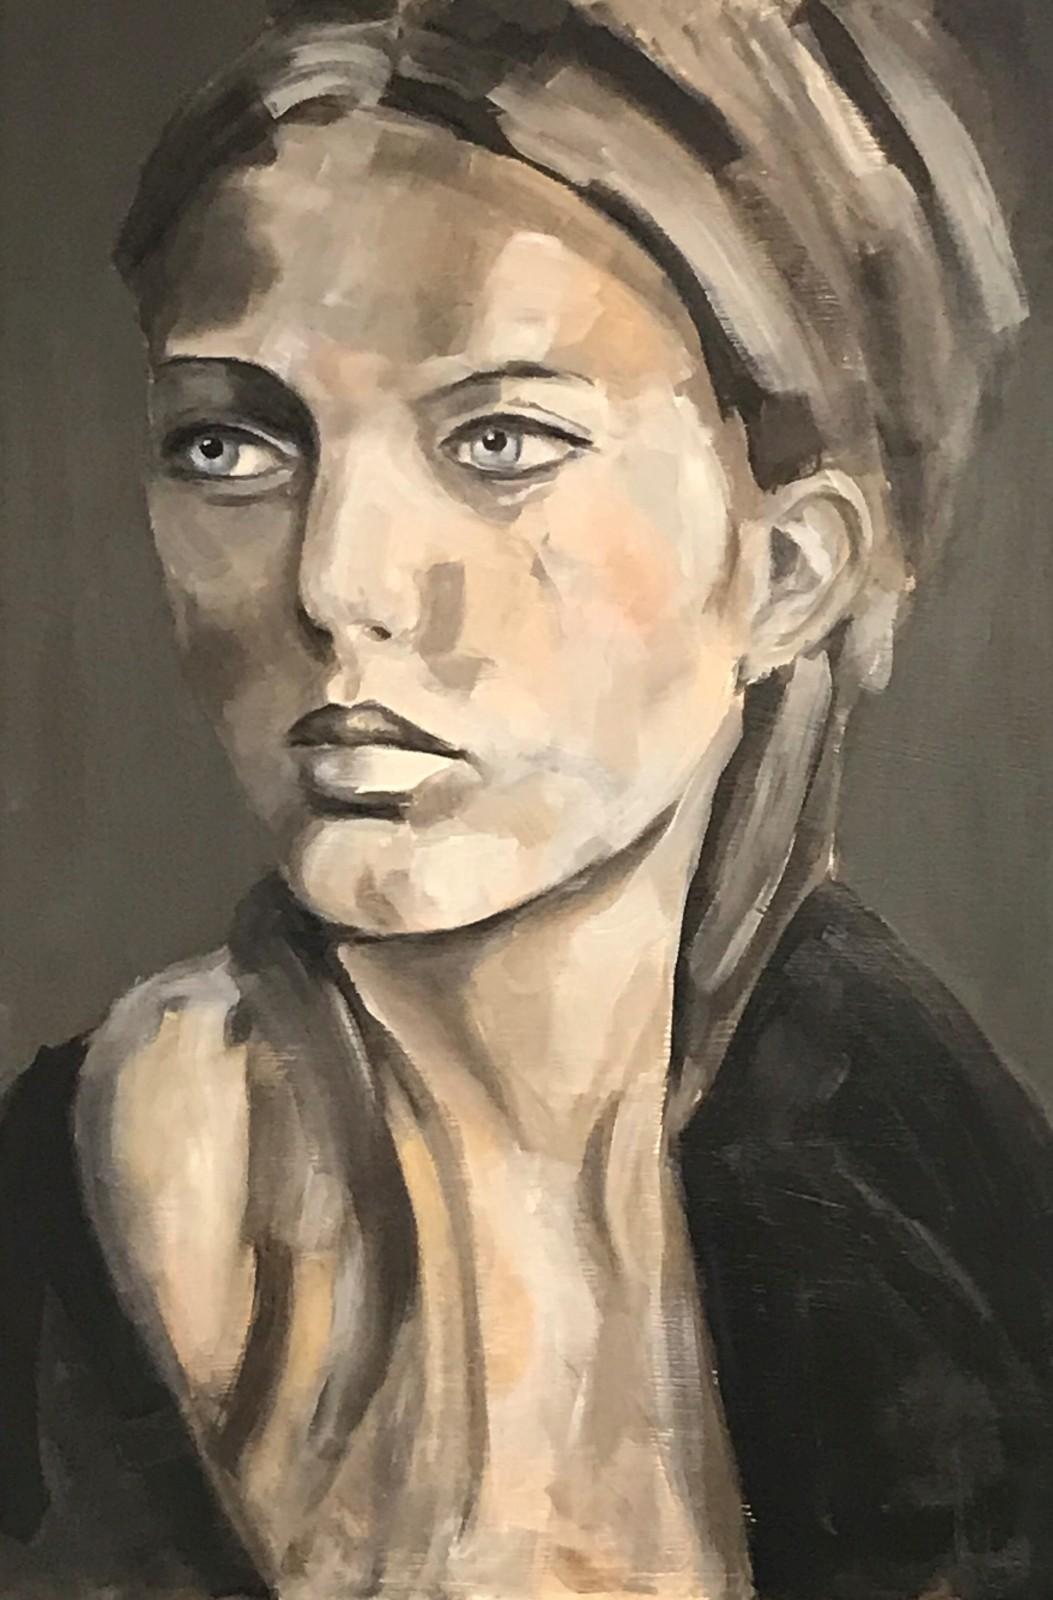 Porträt 'Ragna', Öl auf Leinwand, 120 cm h x 80 cm b x 3 cm t